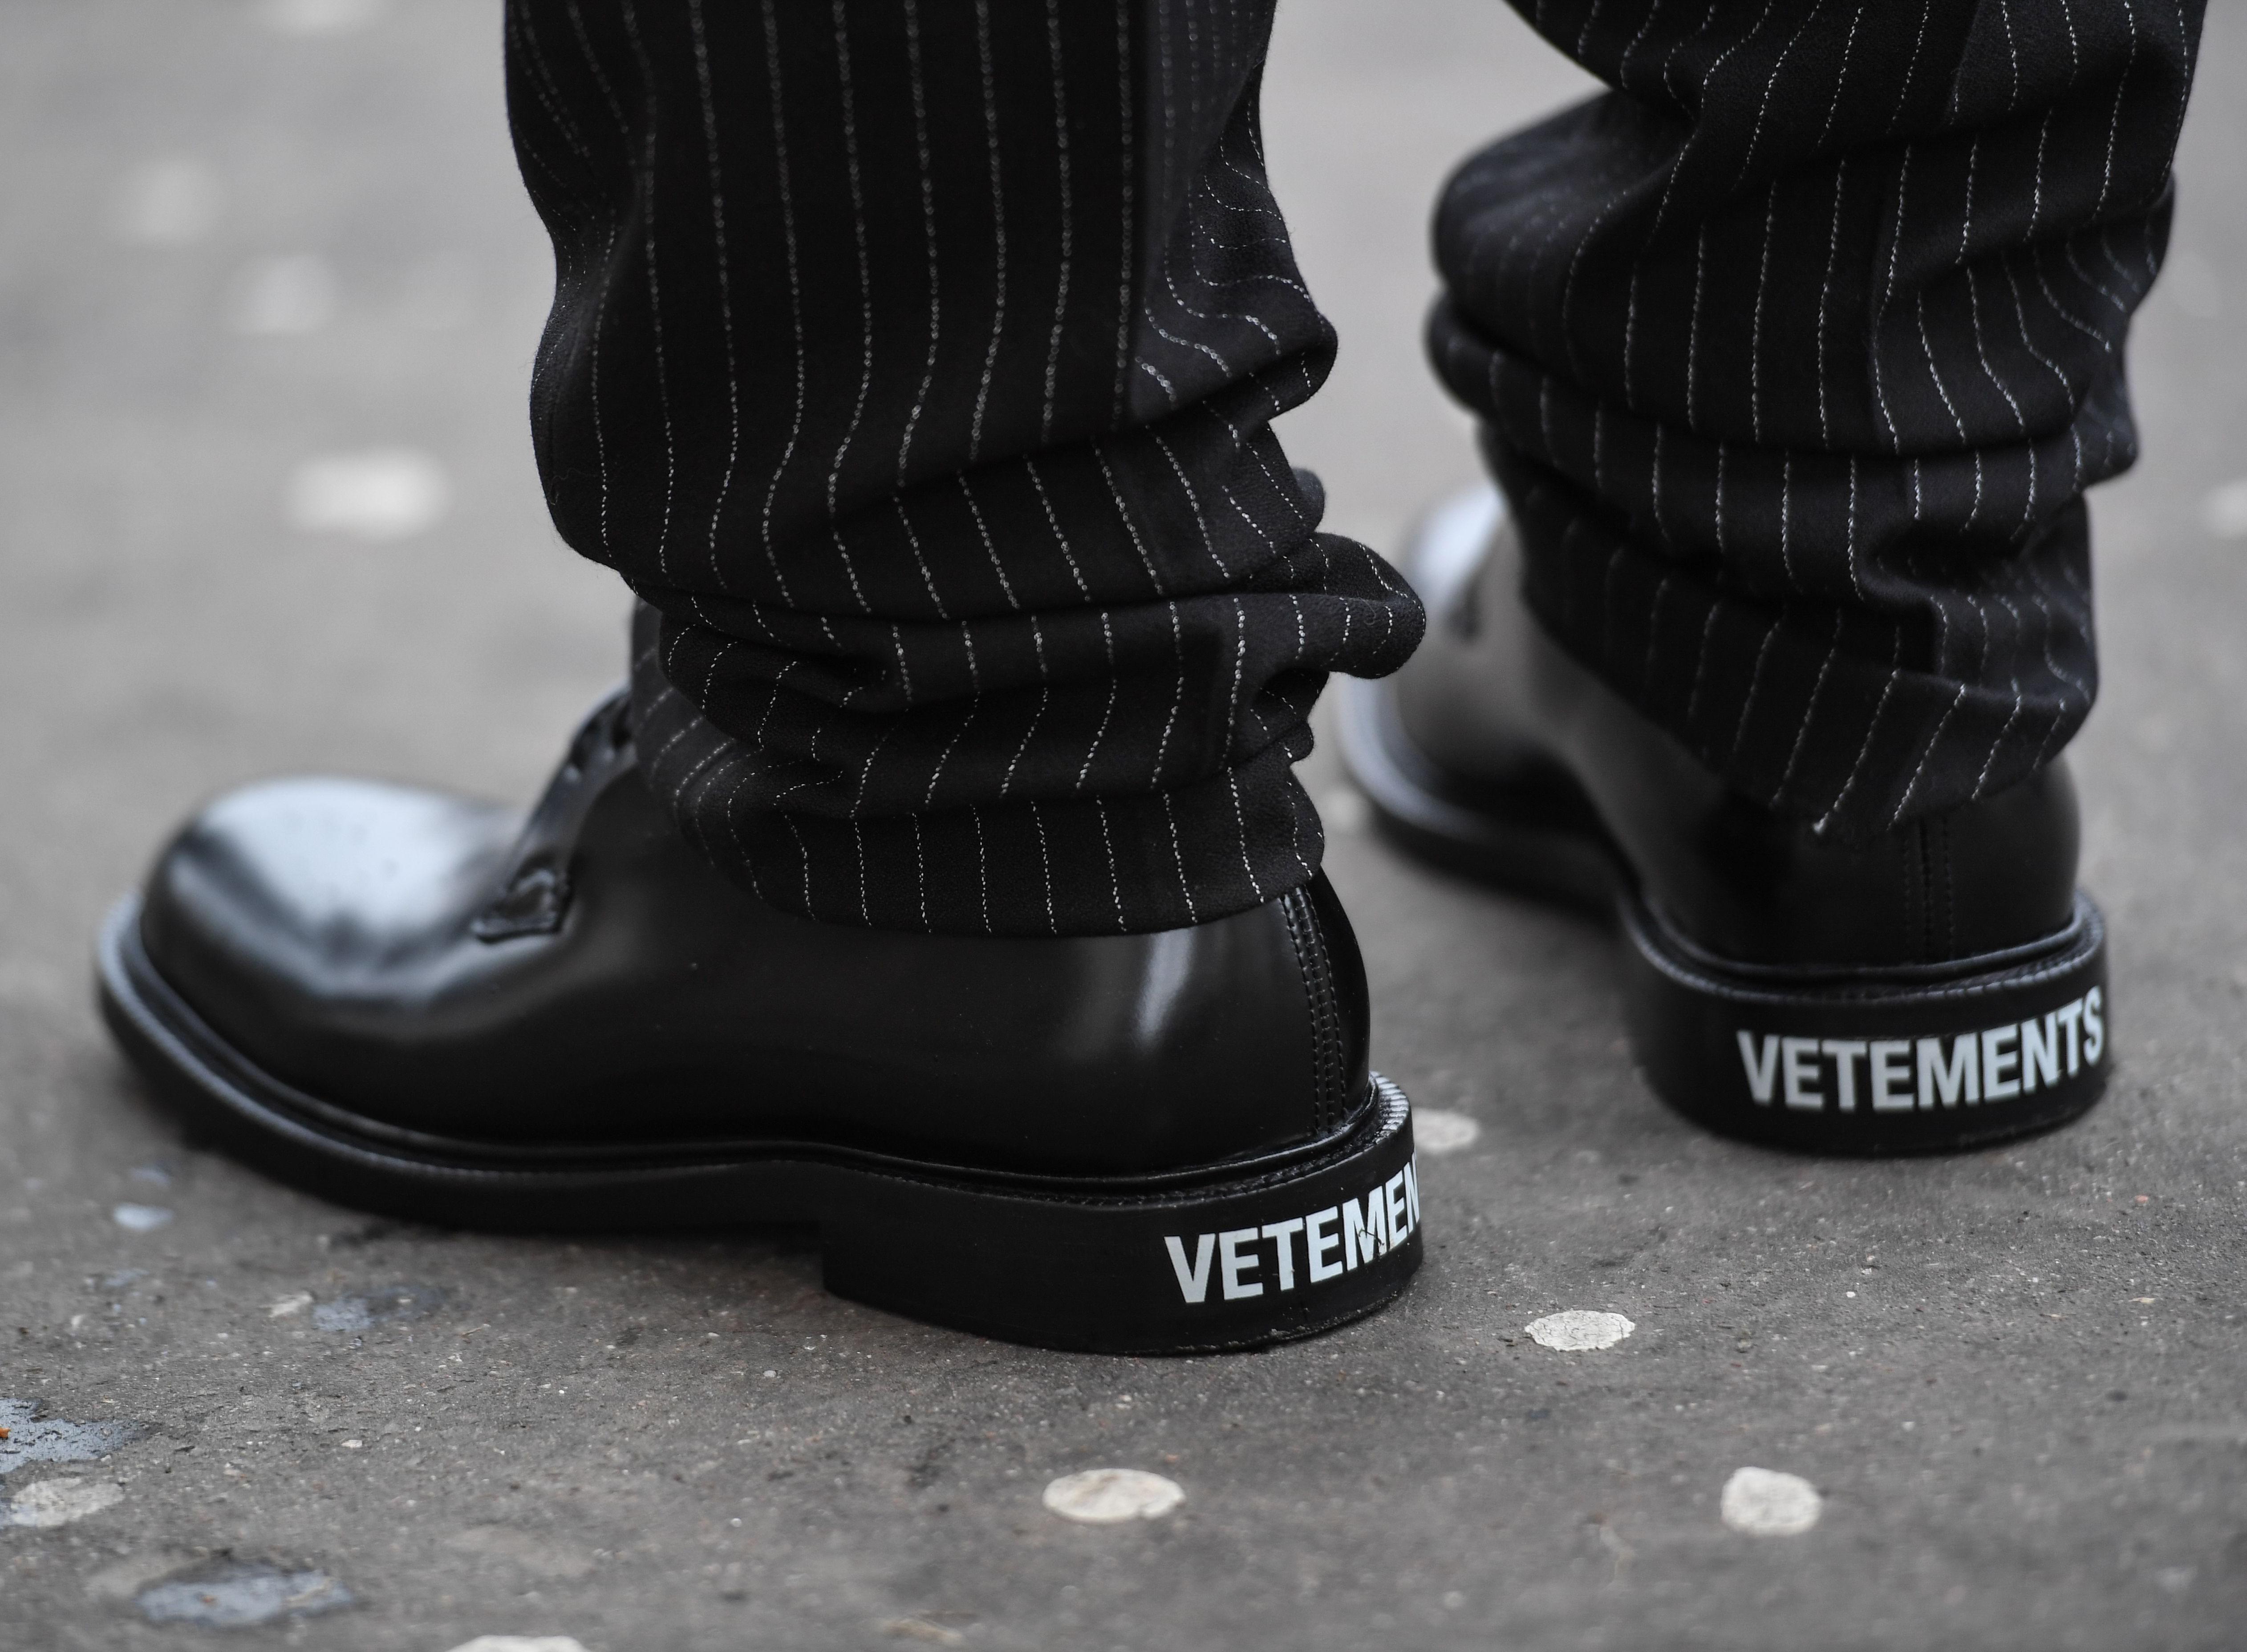 Nemme tips: Sådan passer du på dine sko og sneakers | IN